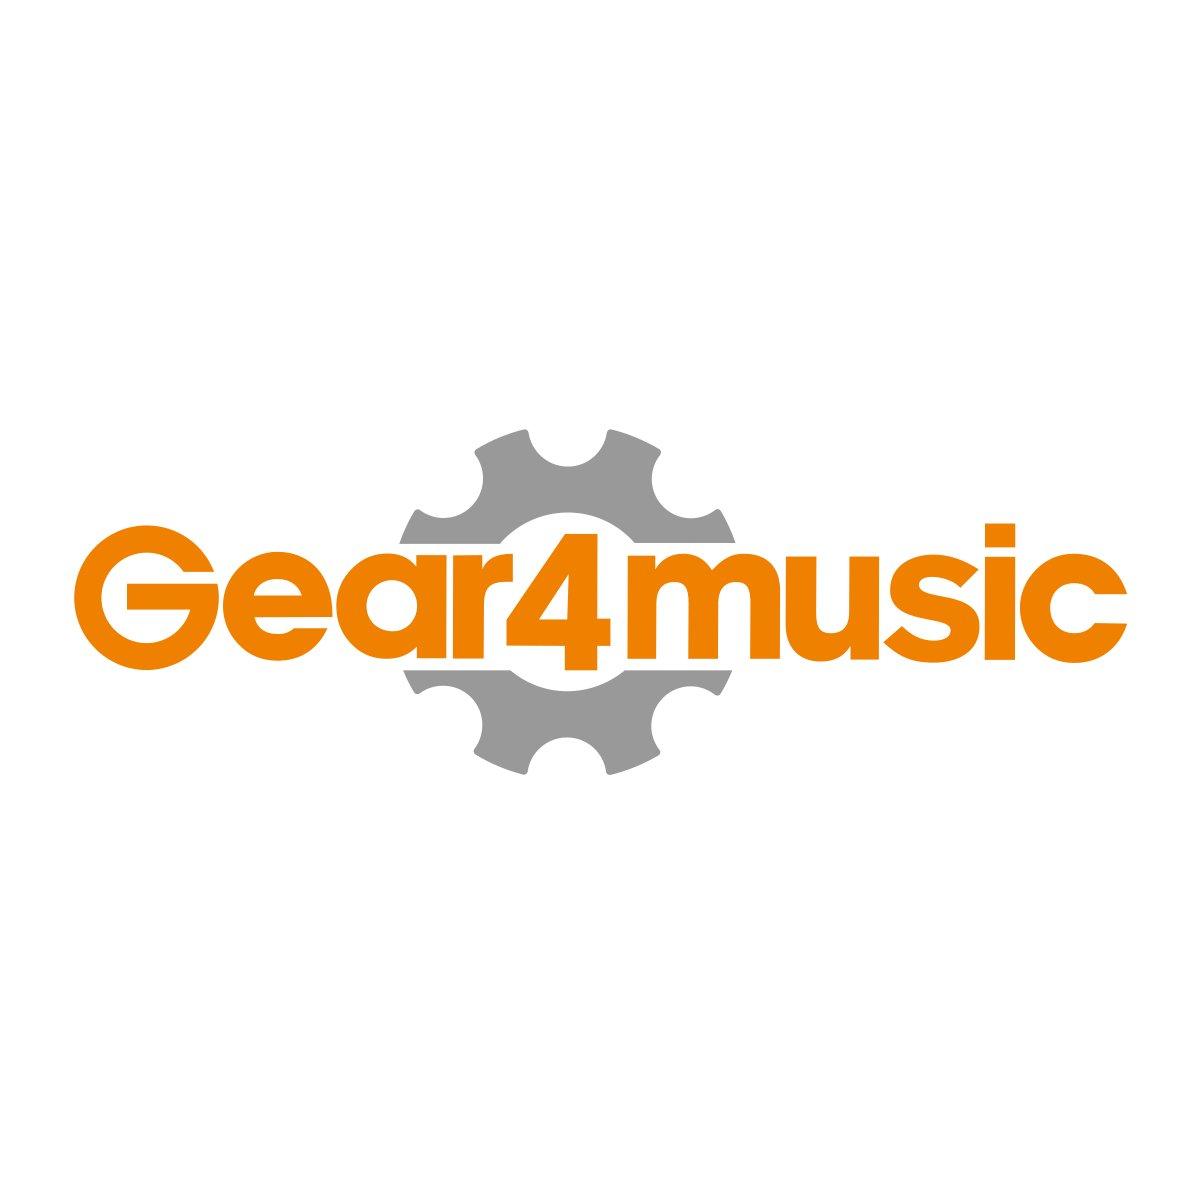 MK-3000 Key-Lighting Keyboard by Gear4music  + Accessory Pack